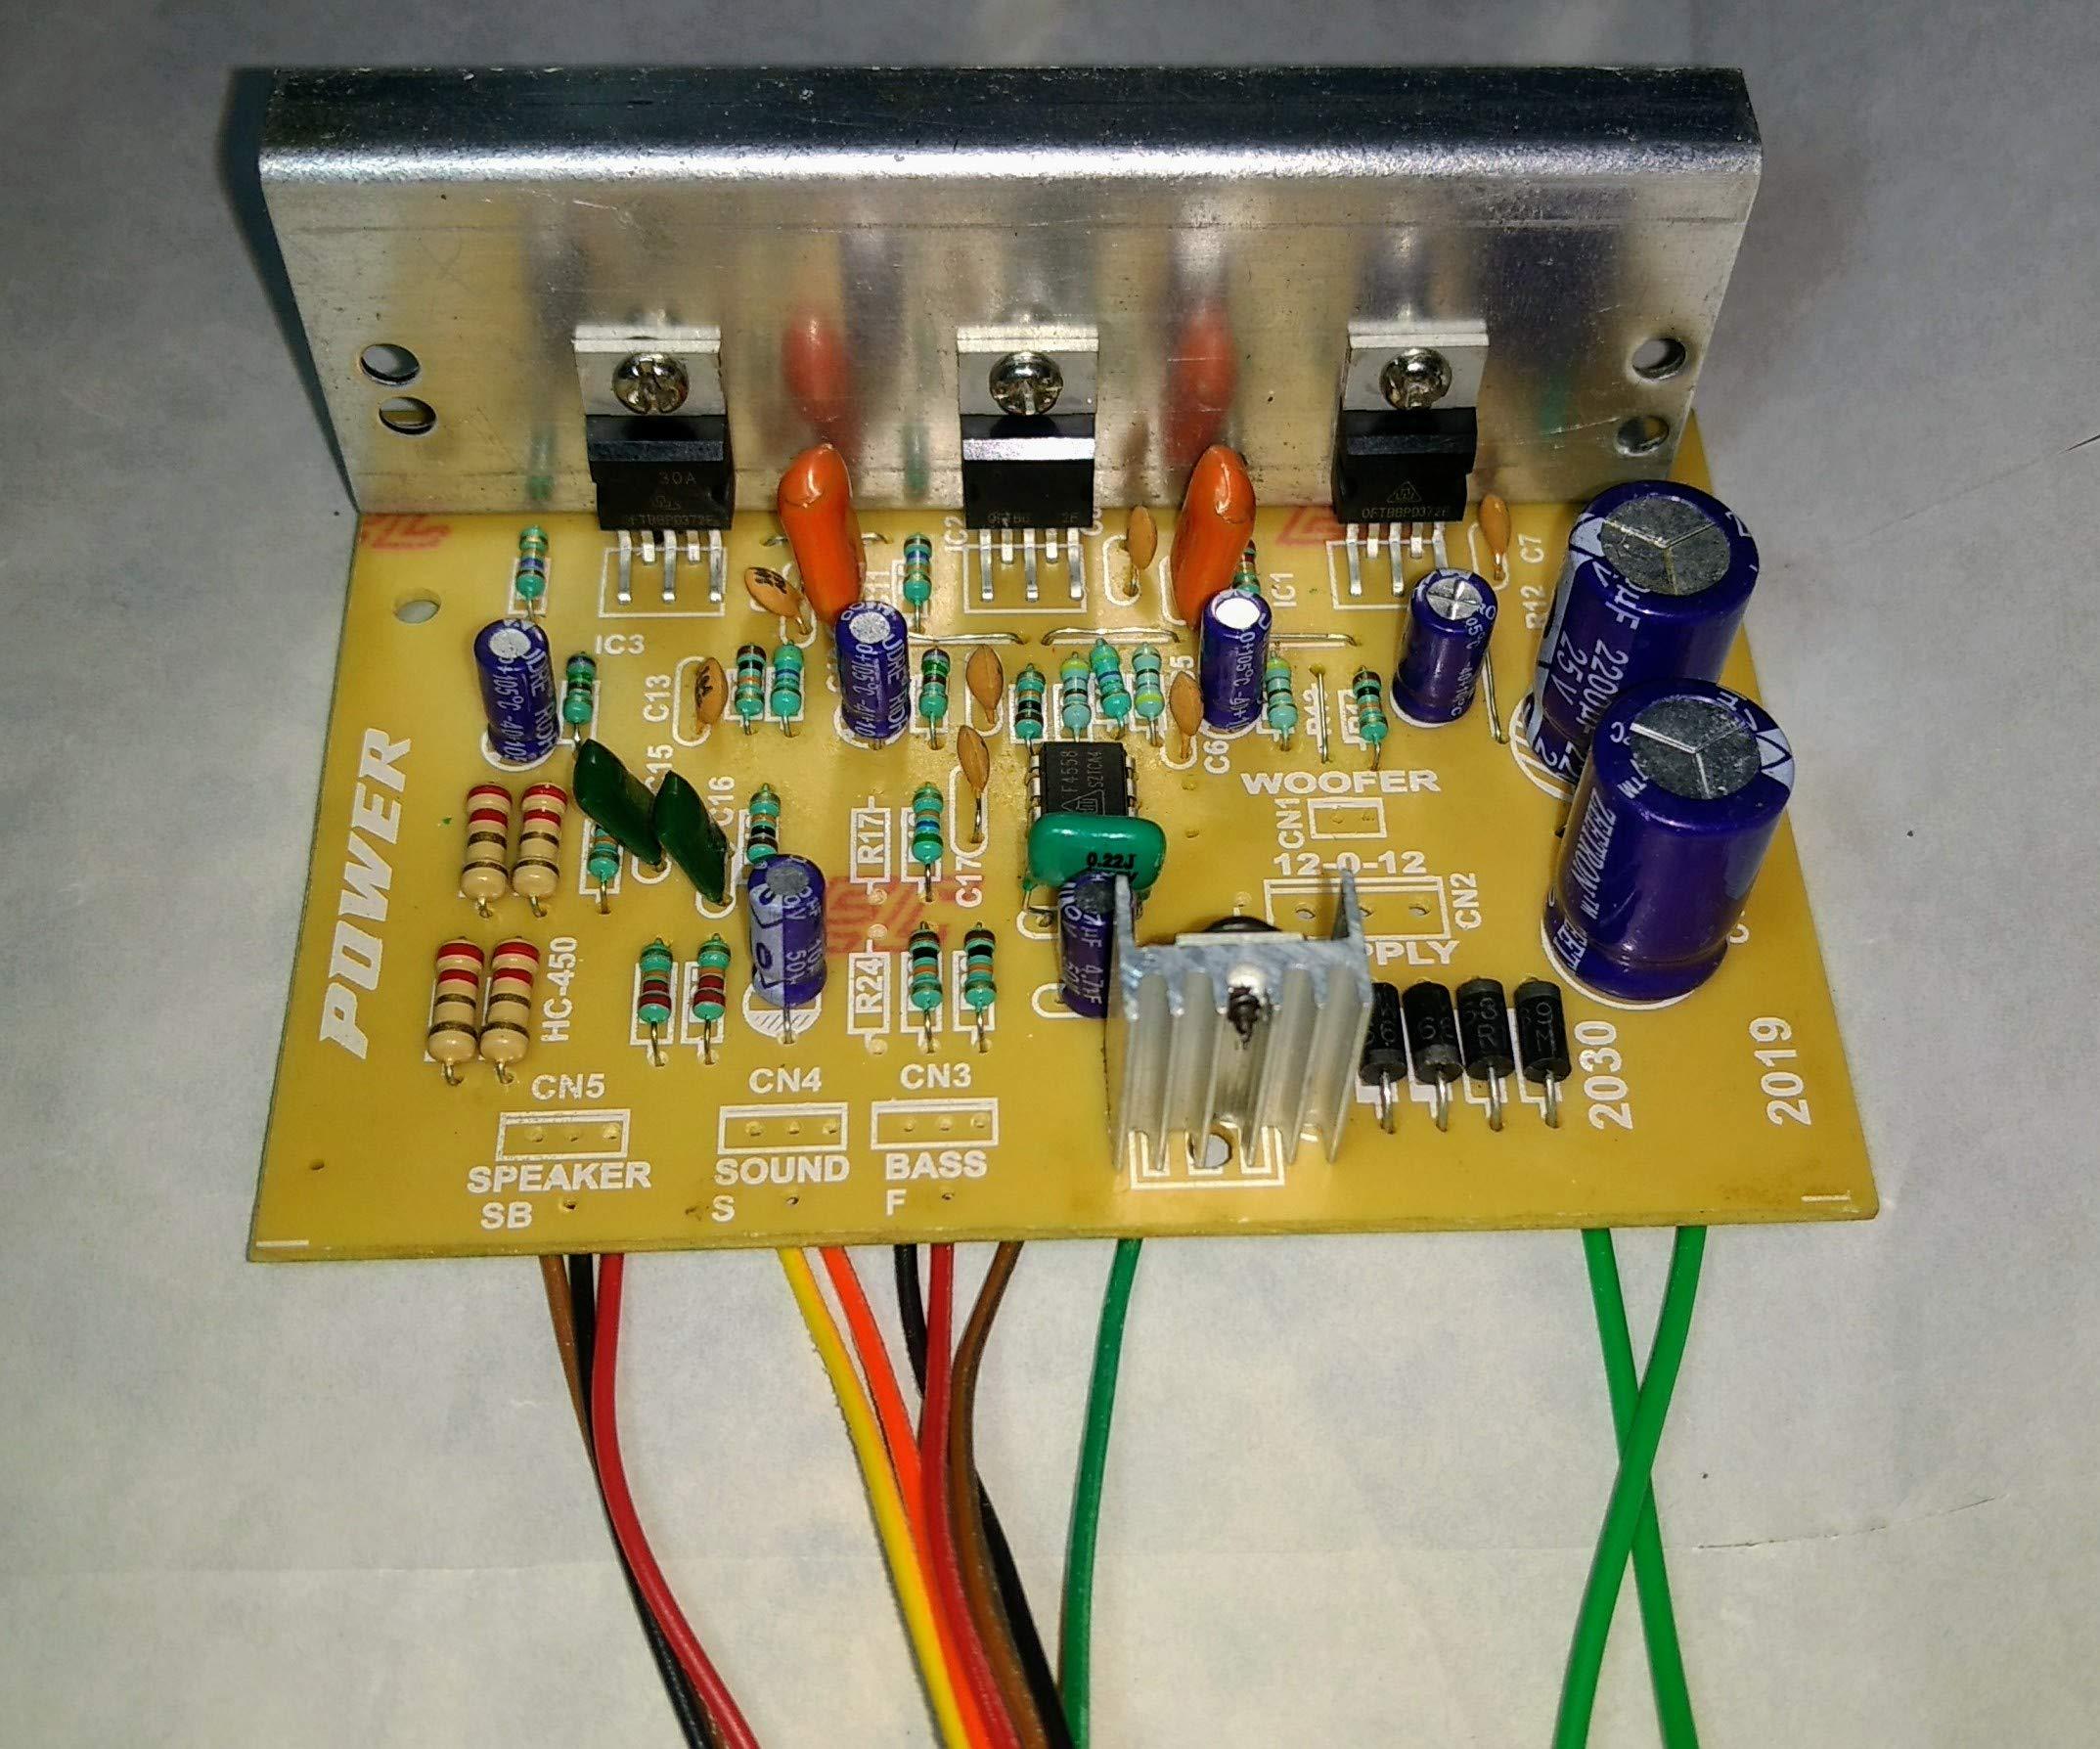 Generic 2 1 Home Theater Amplifier Board Buy Online In Bahamas At Desertcart